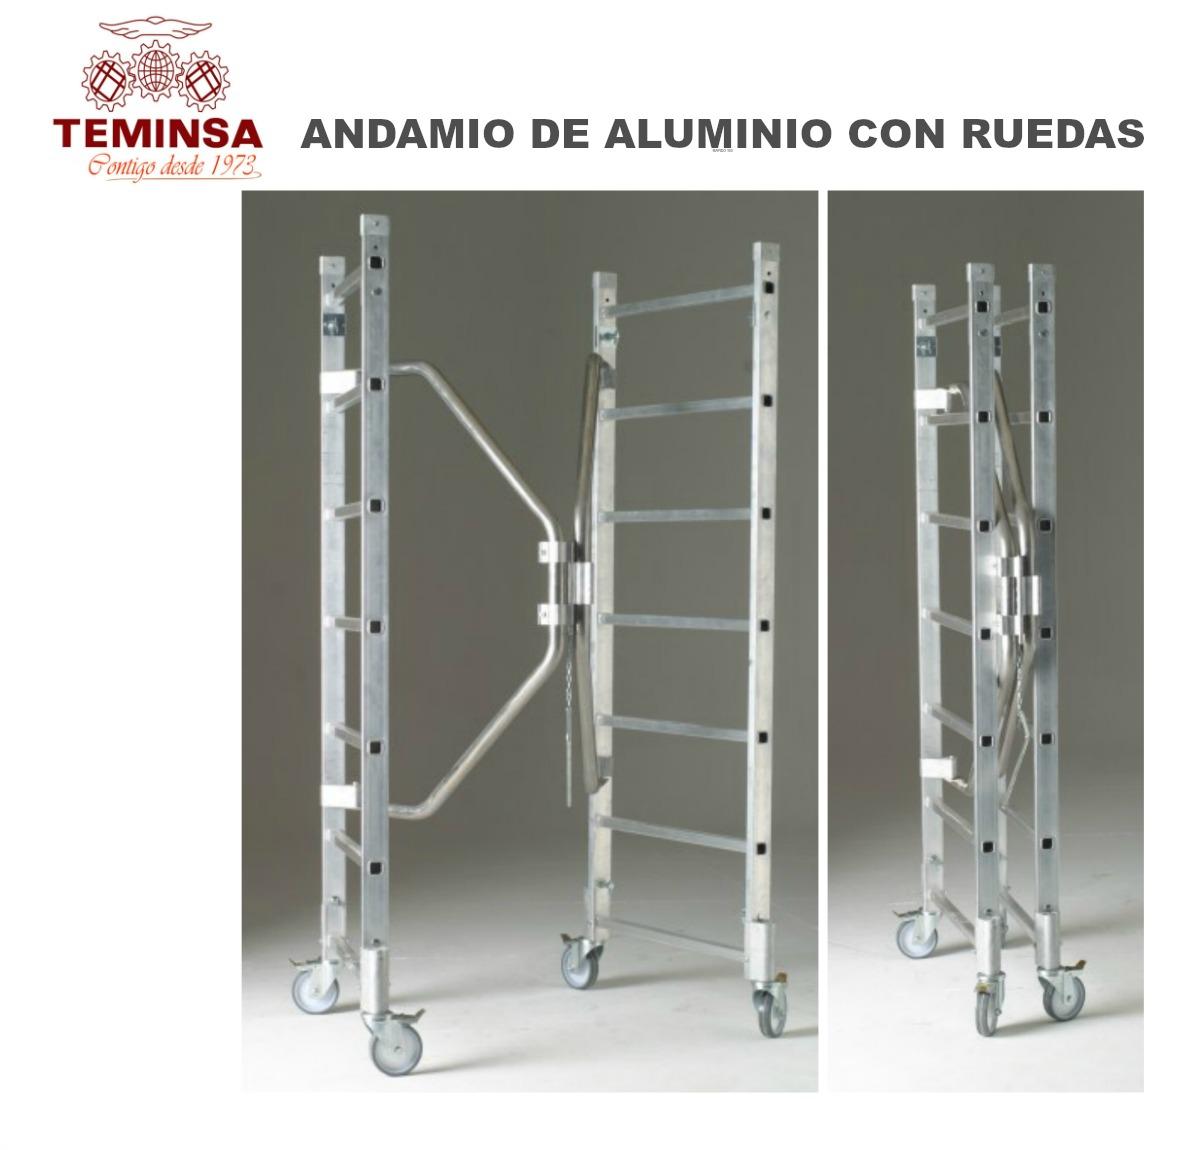 Andamio de Aluminio con Ruedas Teminsa